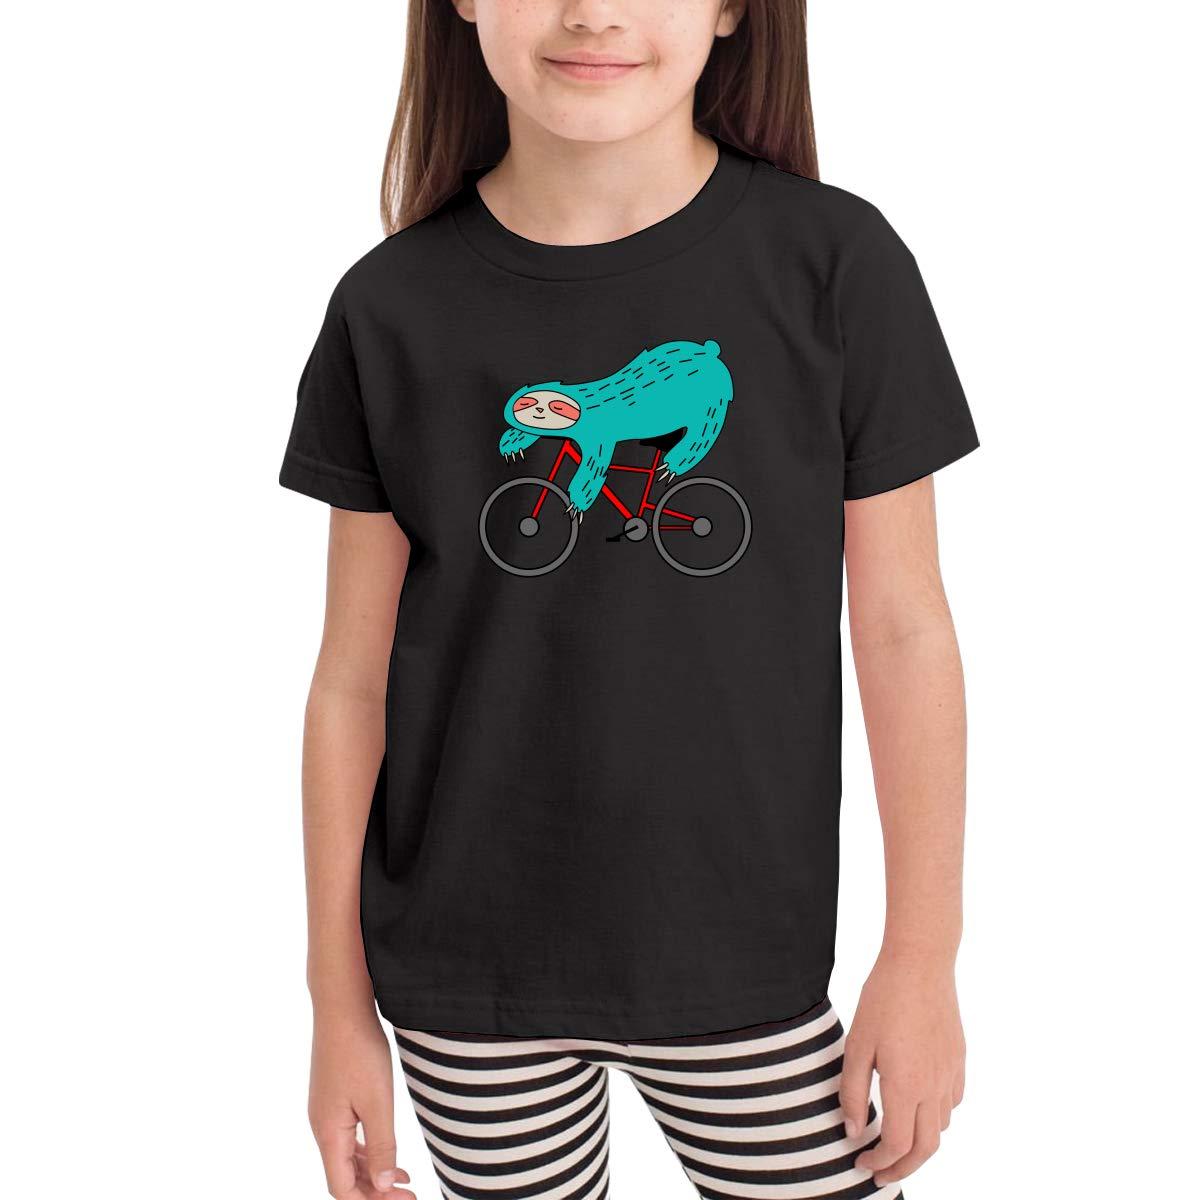 Antonia Bellamy Lazy Sloth Riding A Bicycle Kids Short Sleeve Crew Neck Tees